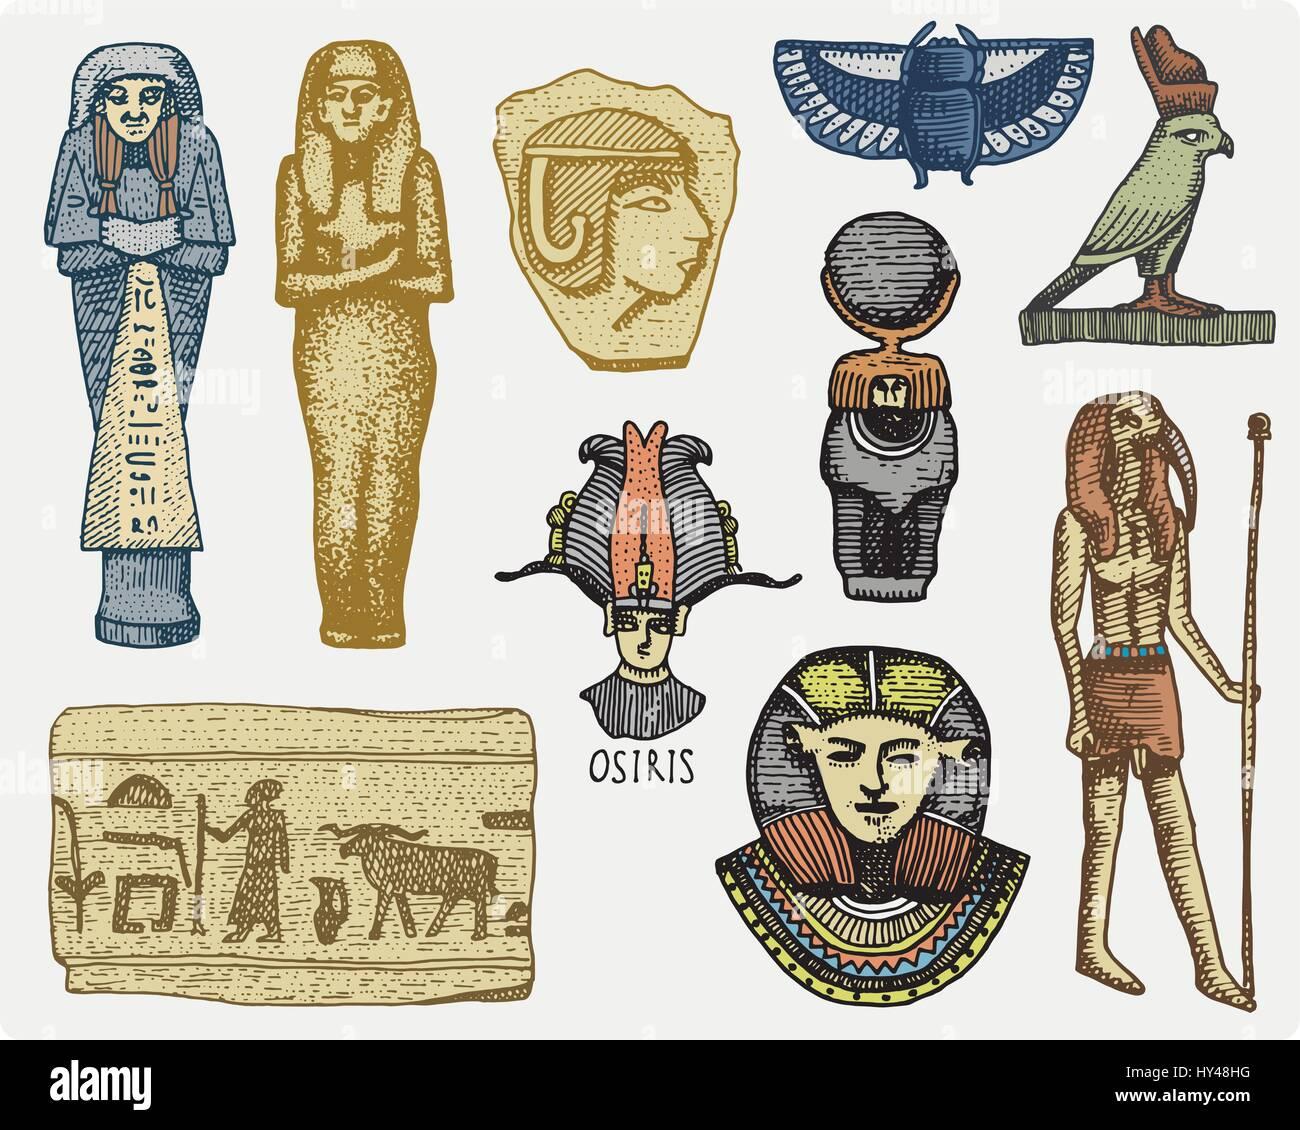 Egyptian symbols pharaon scorob hieroglyphics and osiris head egyptian symbols pharaon scorob hieroglyphics and osiris head god vintage engraved hand drawn in sketch or wood cut style old looking retro biocorpaavc